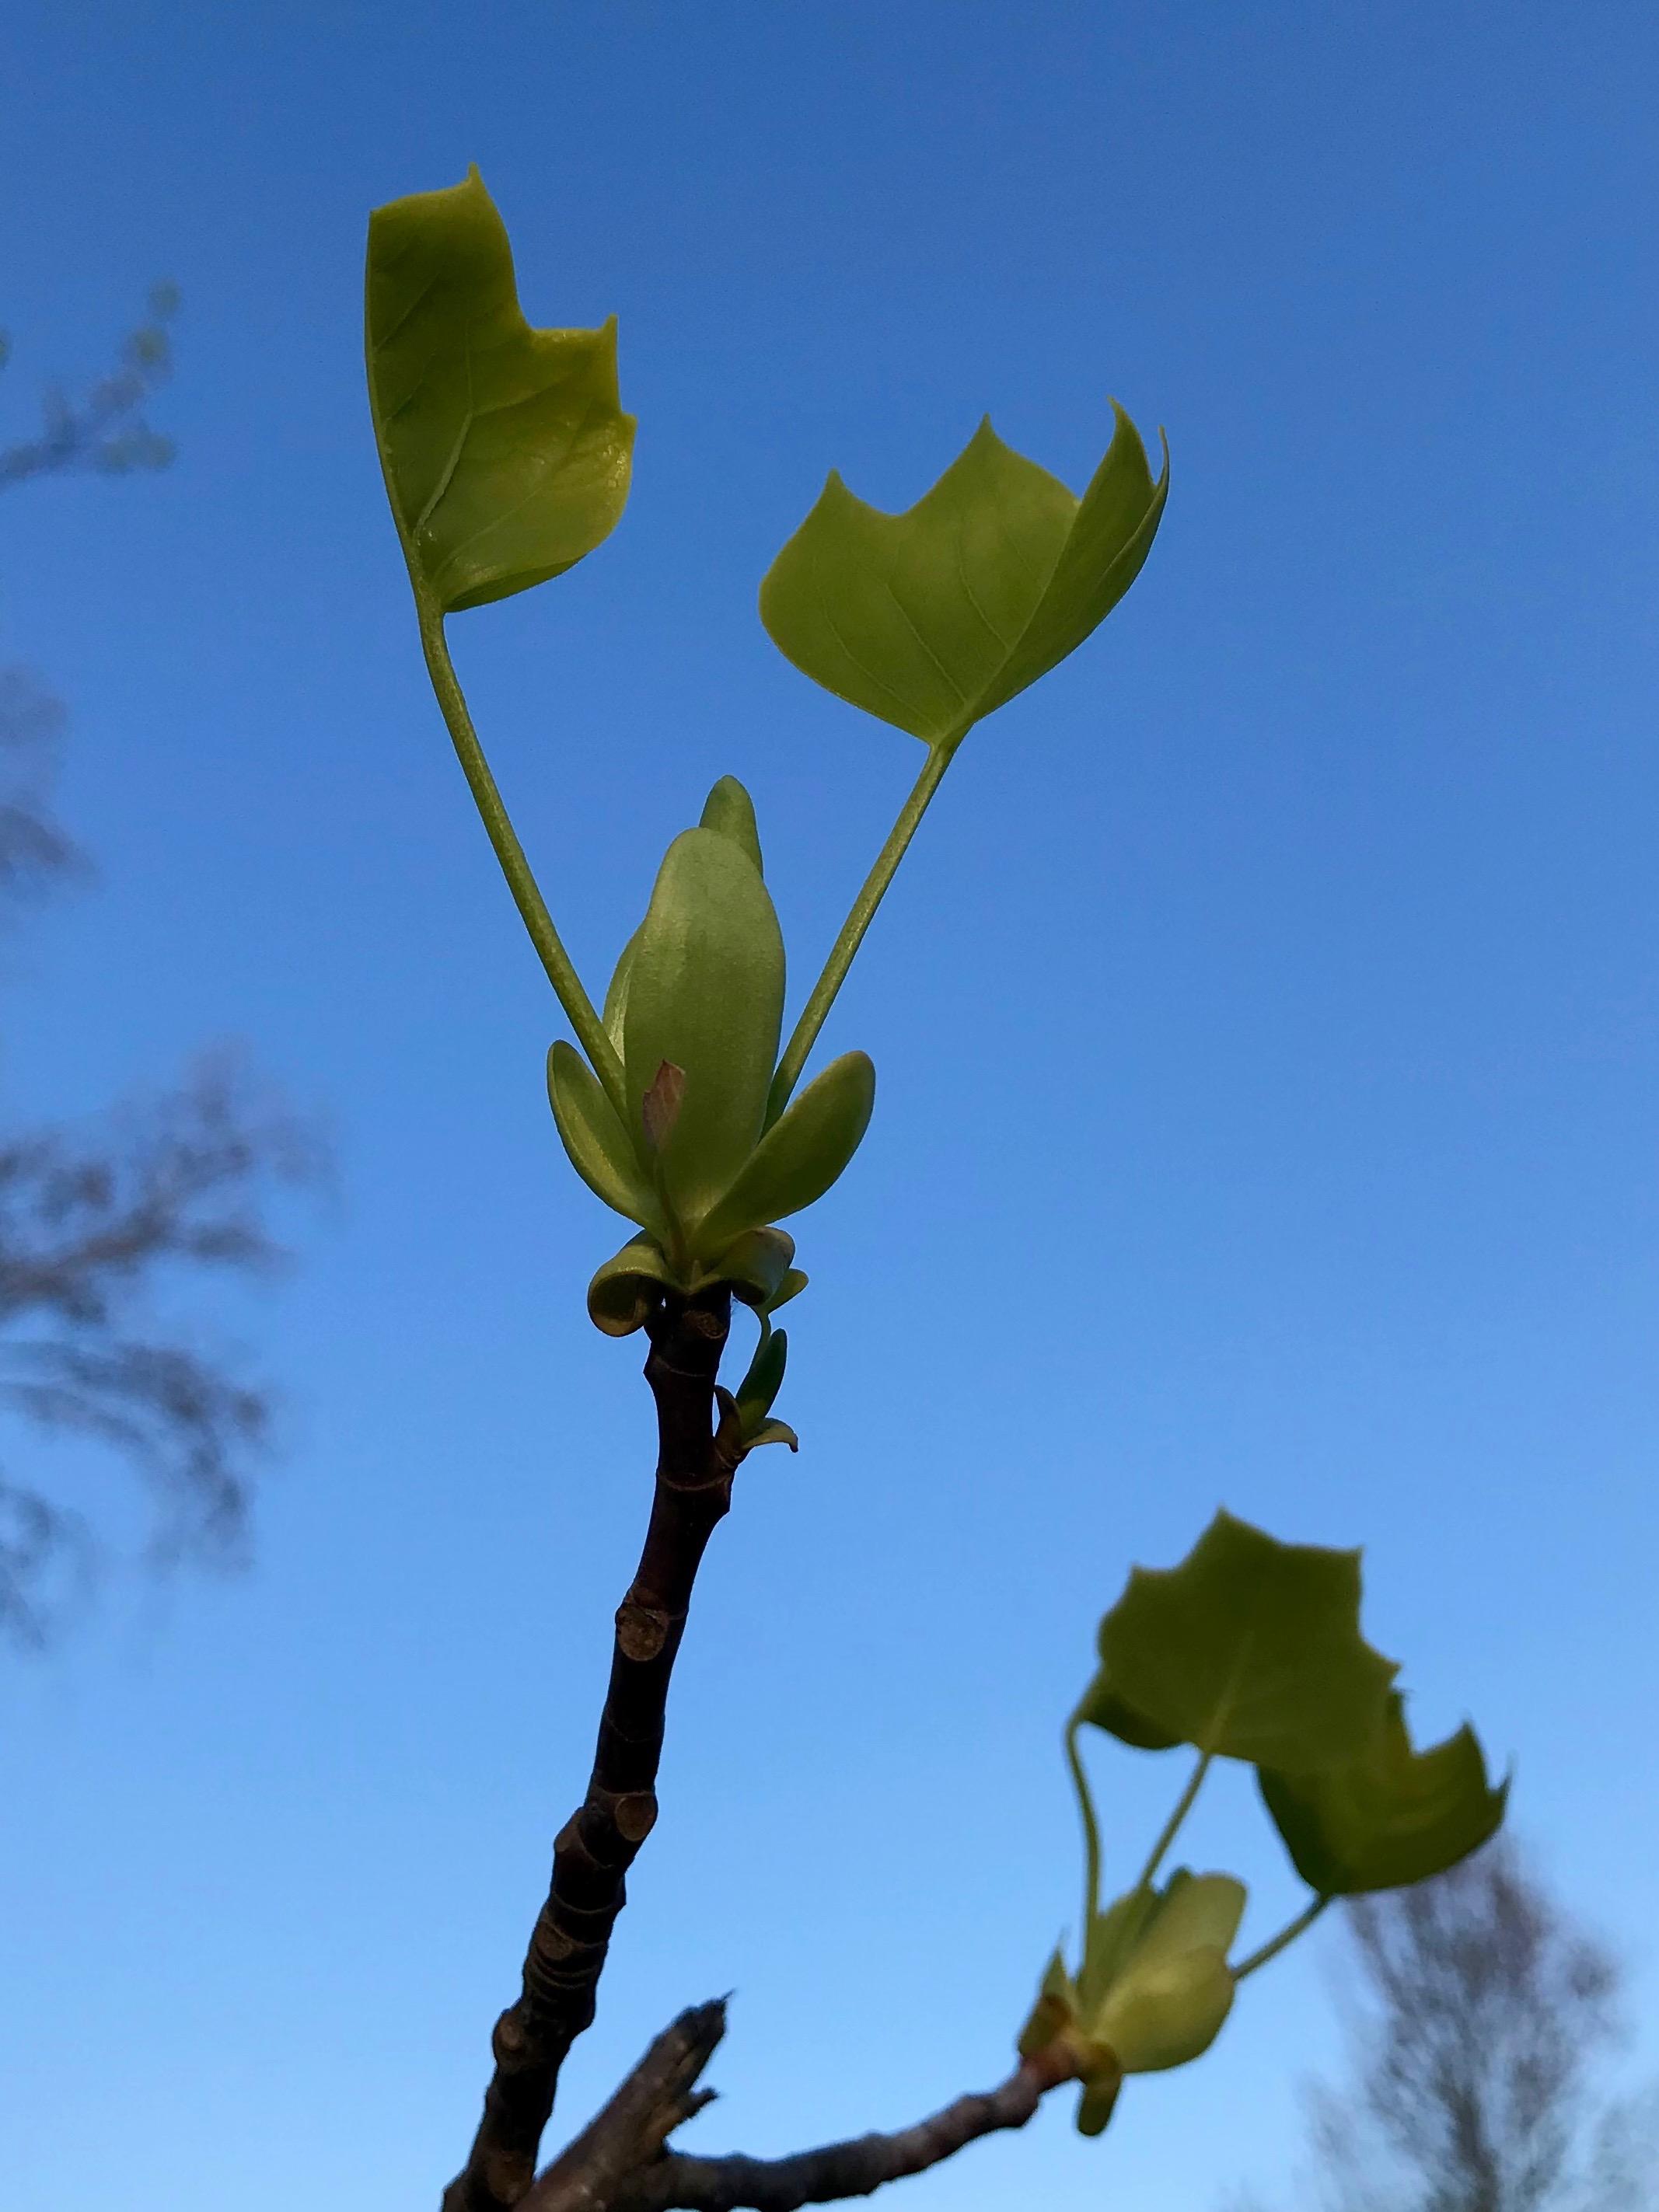 Spring growth